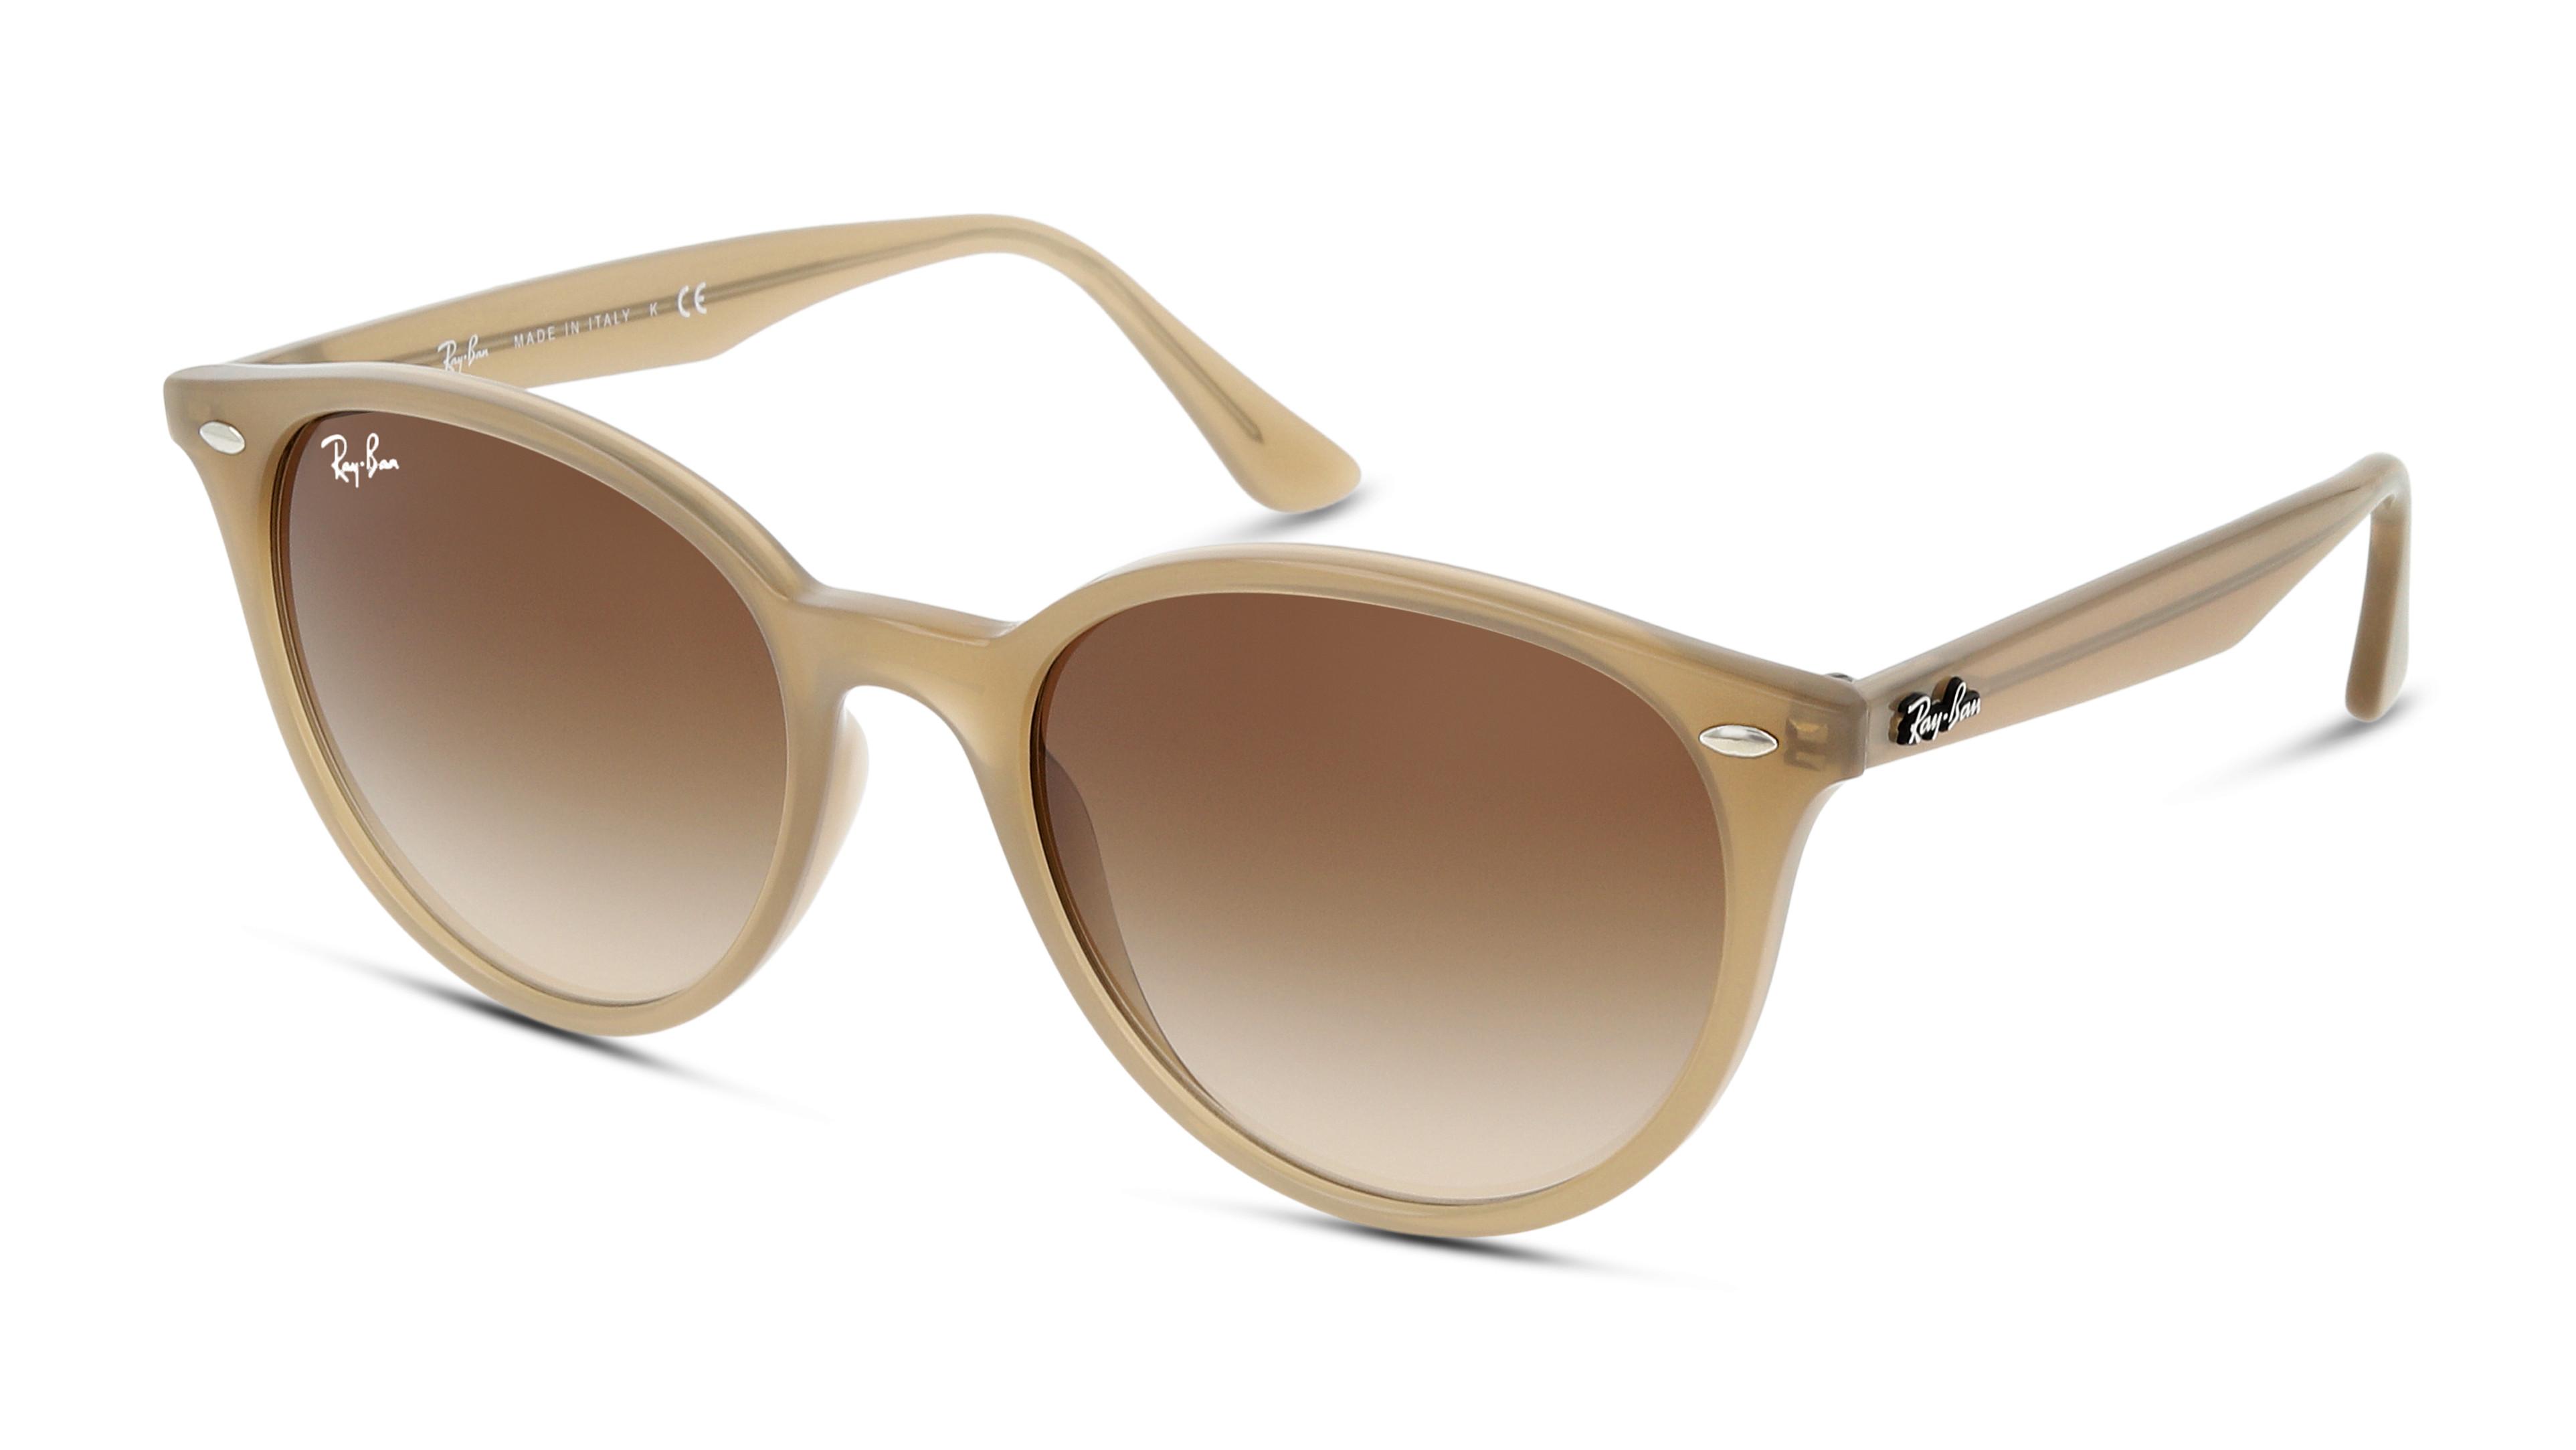 8056597071628-angle-03-ray-ban-0rb4305-eyewear-opal-beige_1